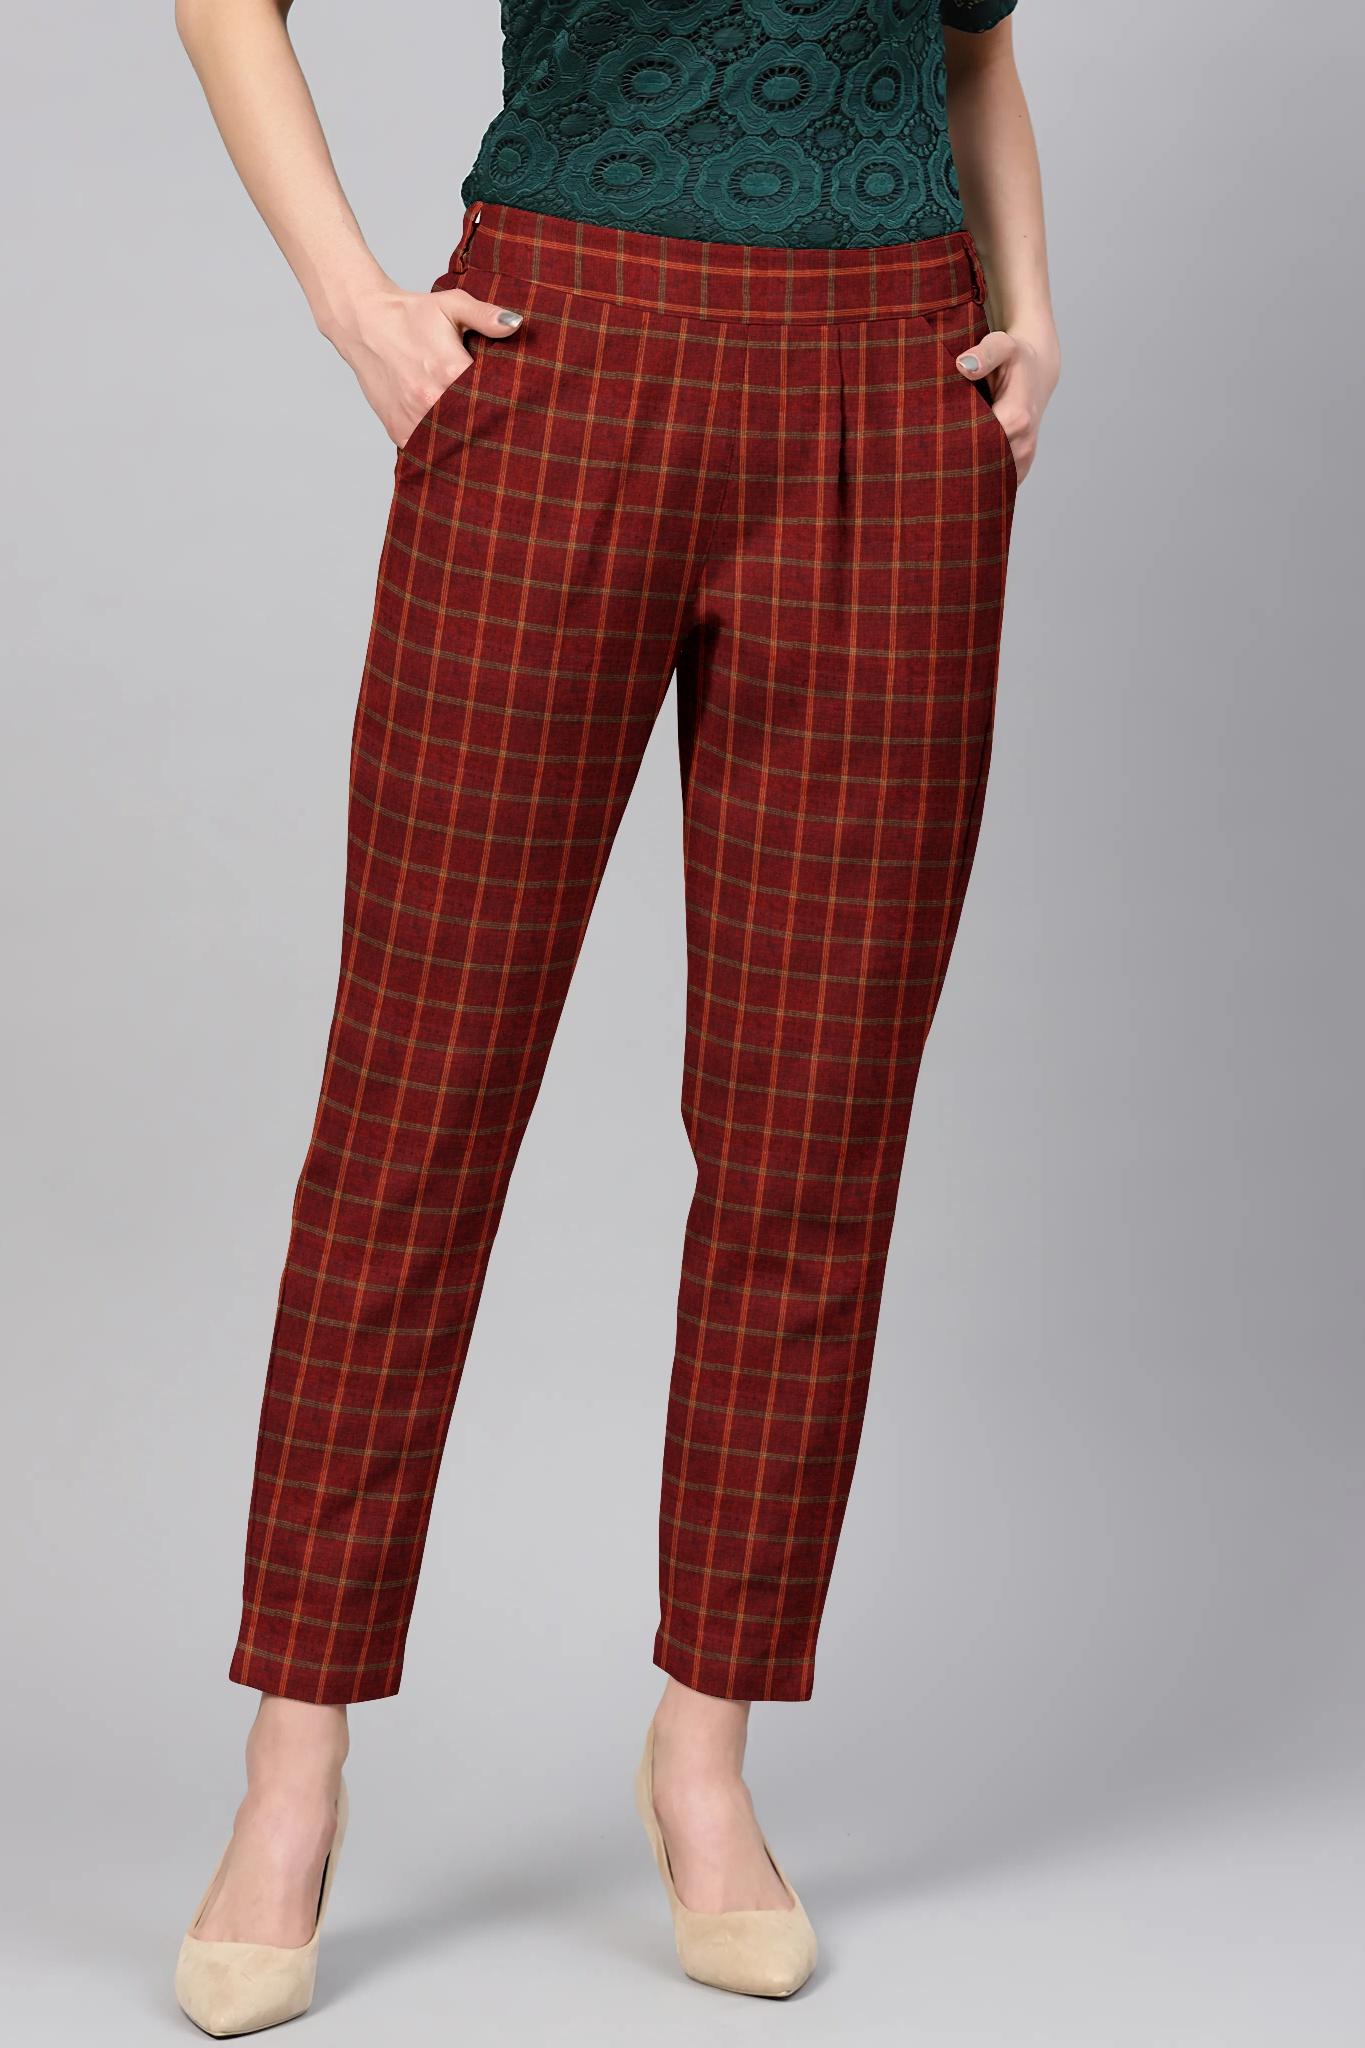 /home/customer/www/fabartcraft.com/public_html/uploadshttps://www.shopolics.com/uploads/images/medium/Red-White-Cotton-Check-Regular-Fit-Solid-Trouser-36068.jpg